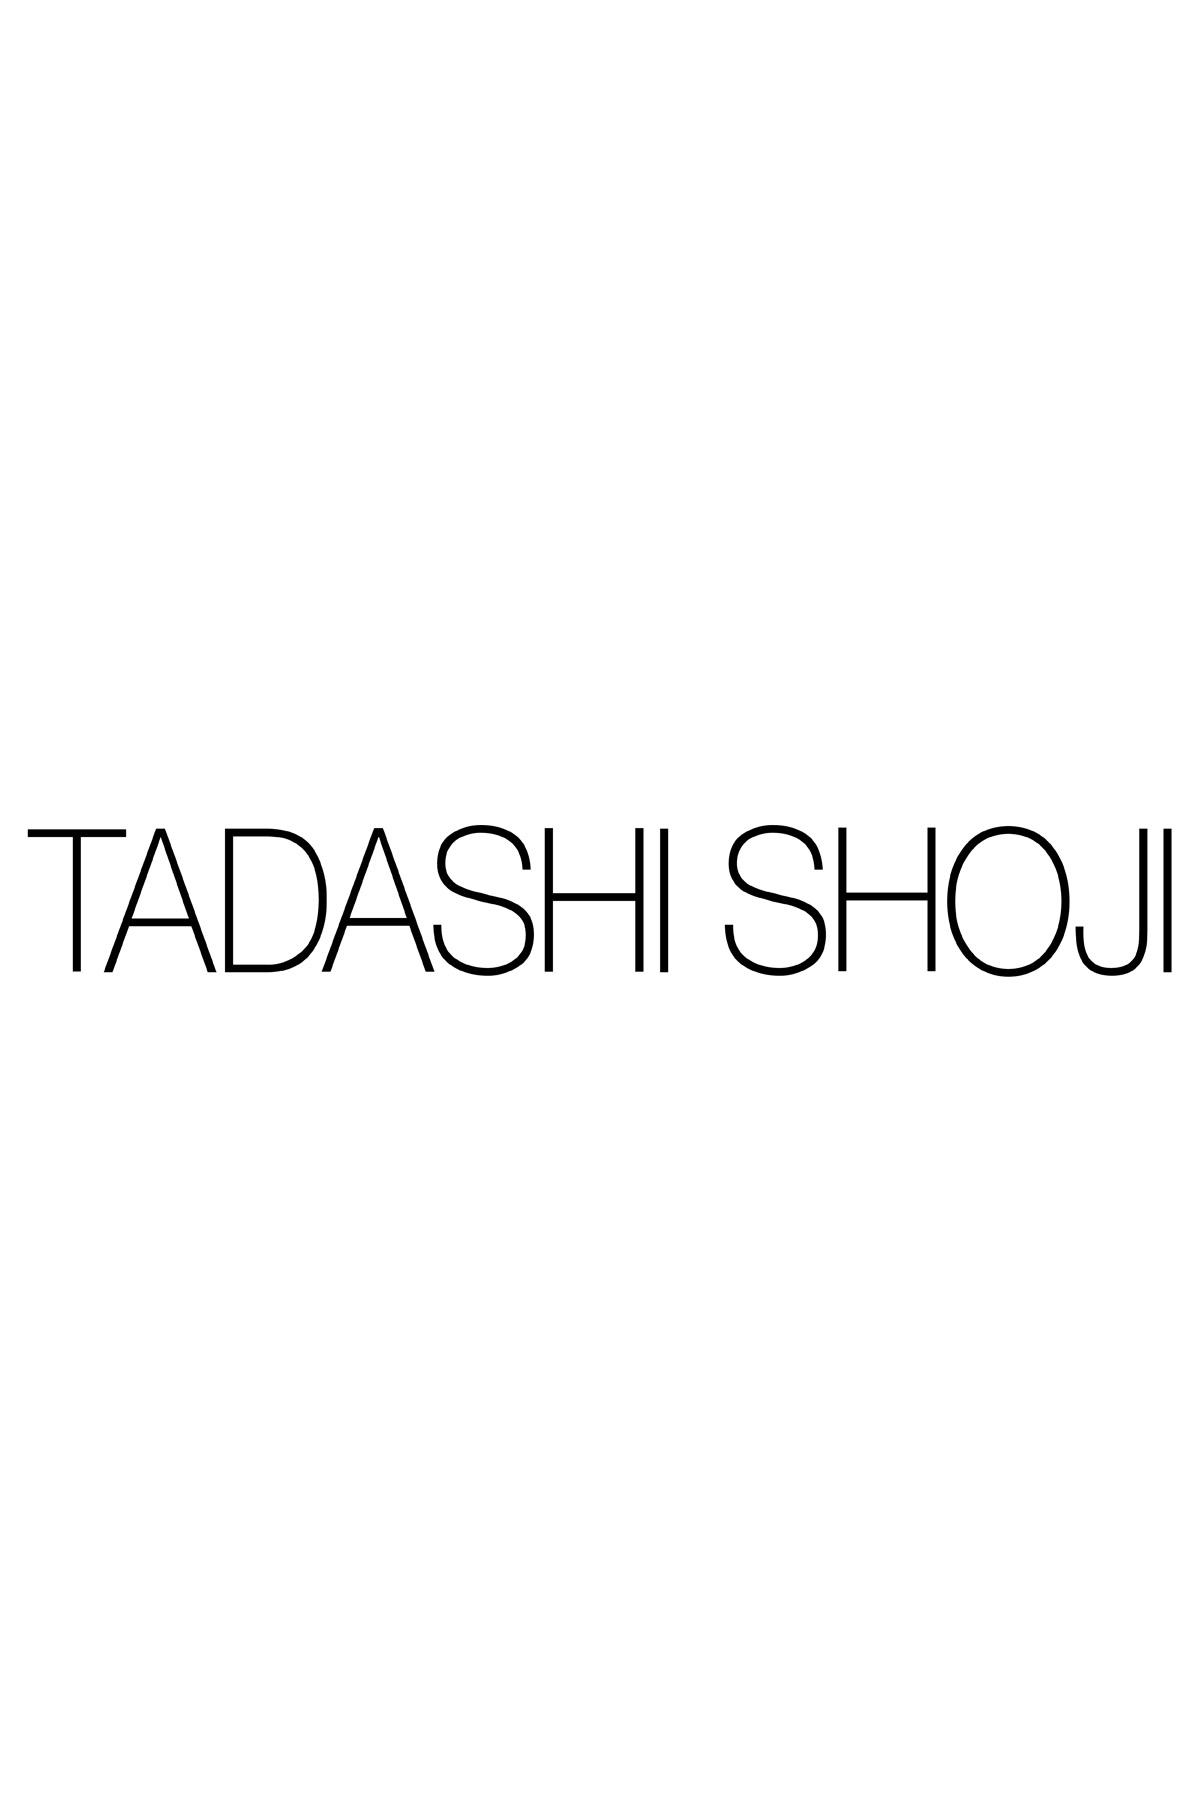 Tadashi Shoji Plus Size - Neoprene and Paillette Embroidered Sheath - Detail